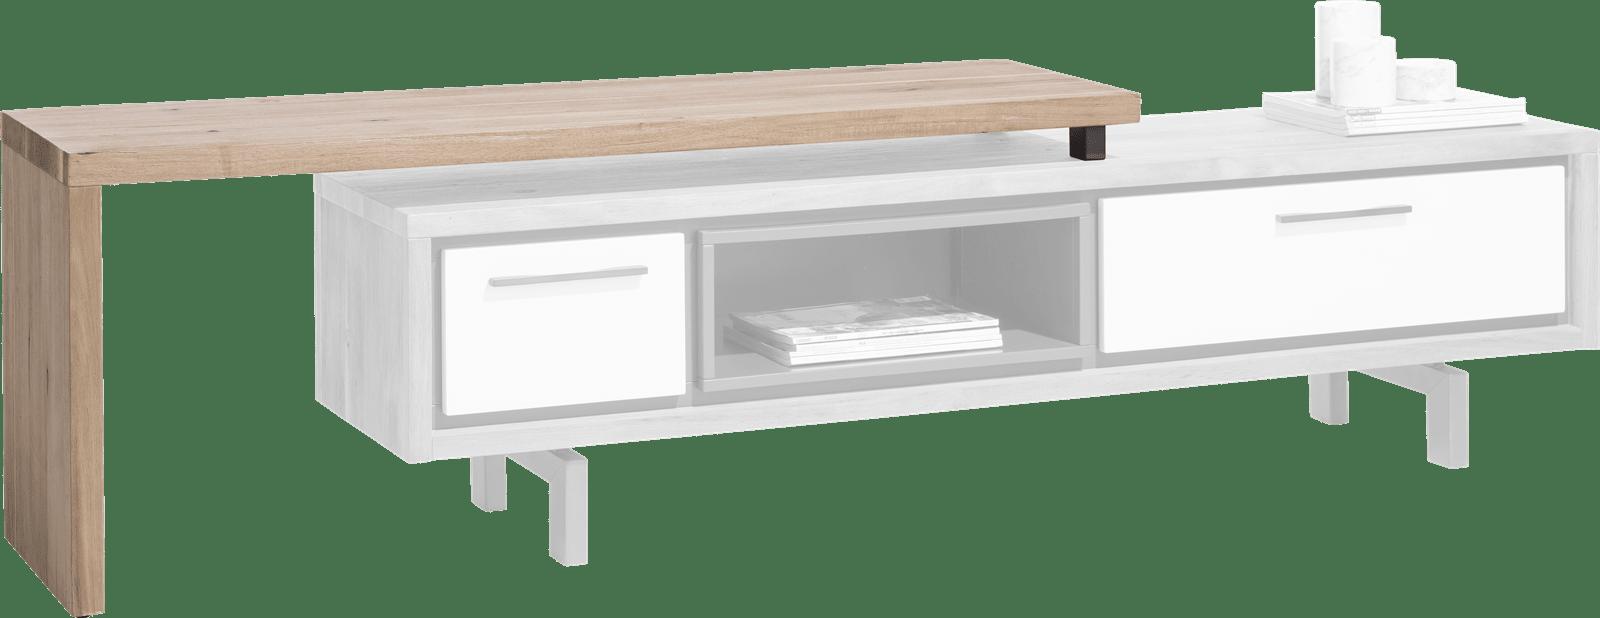 Otta - tv-sideboard mit drehbare platte 140 cm - selbstmontage